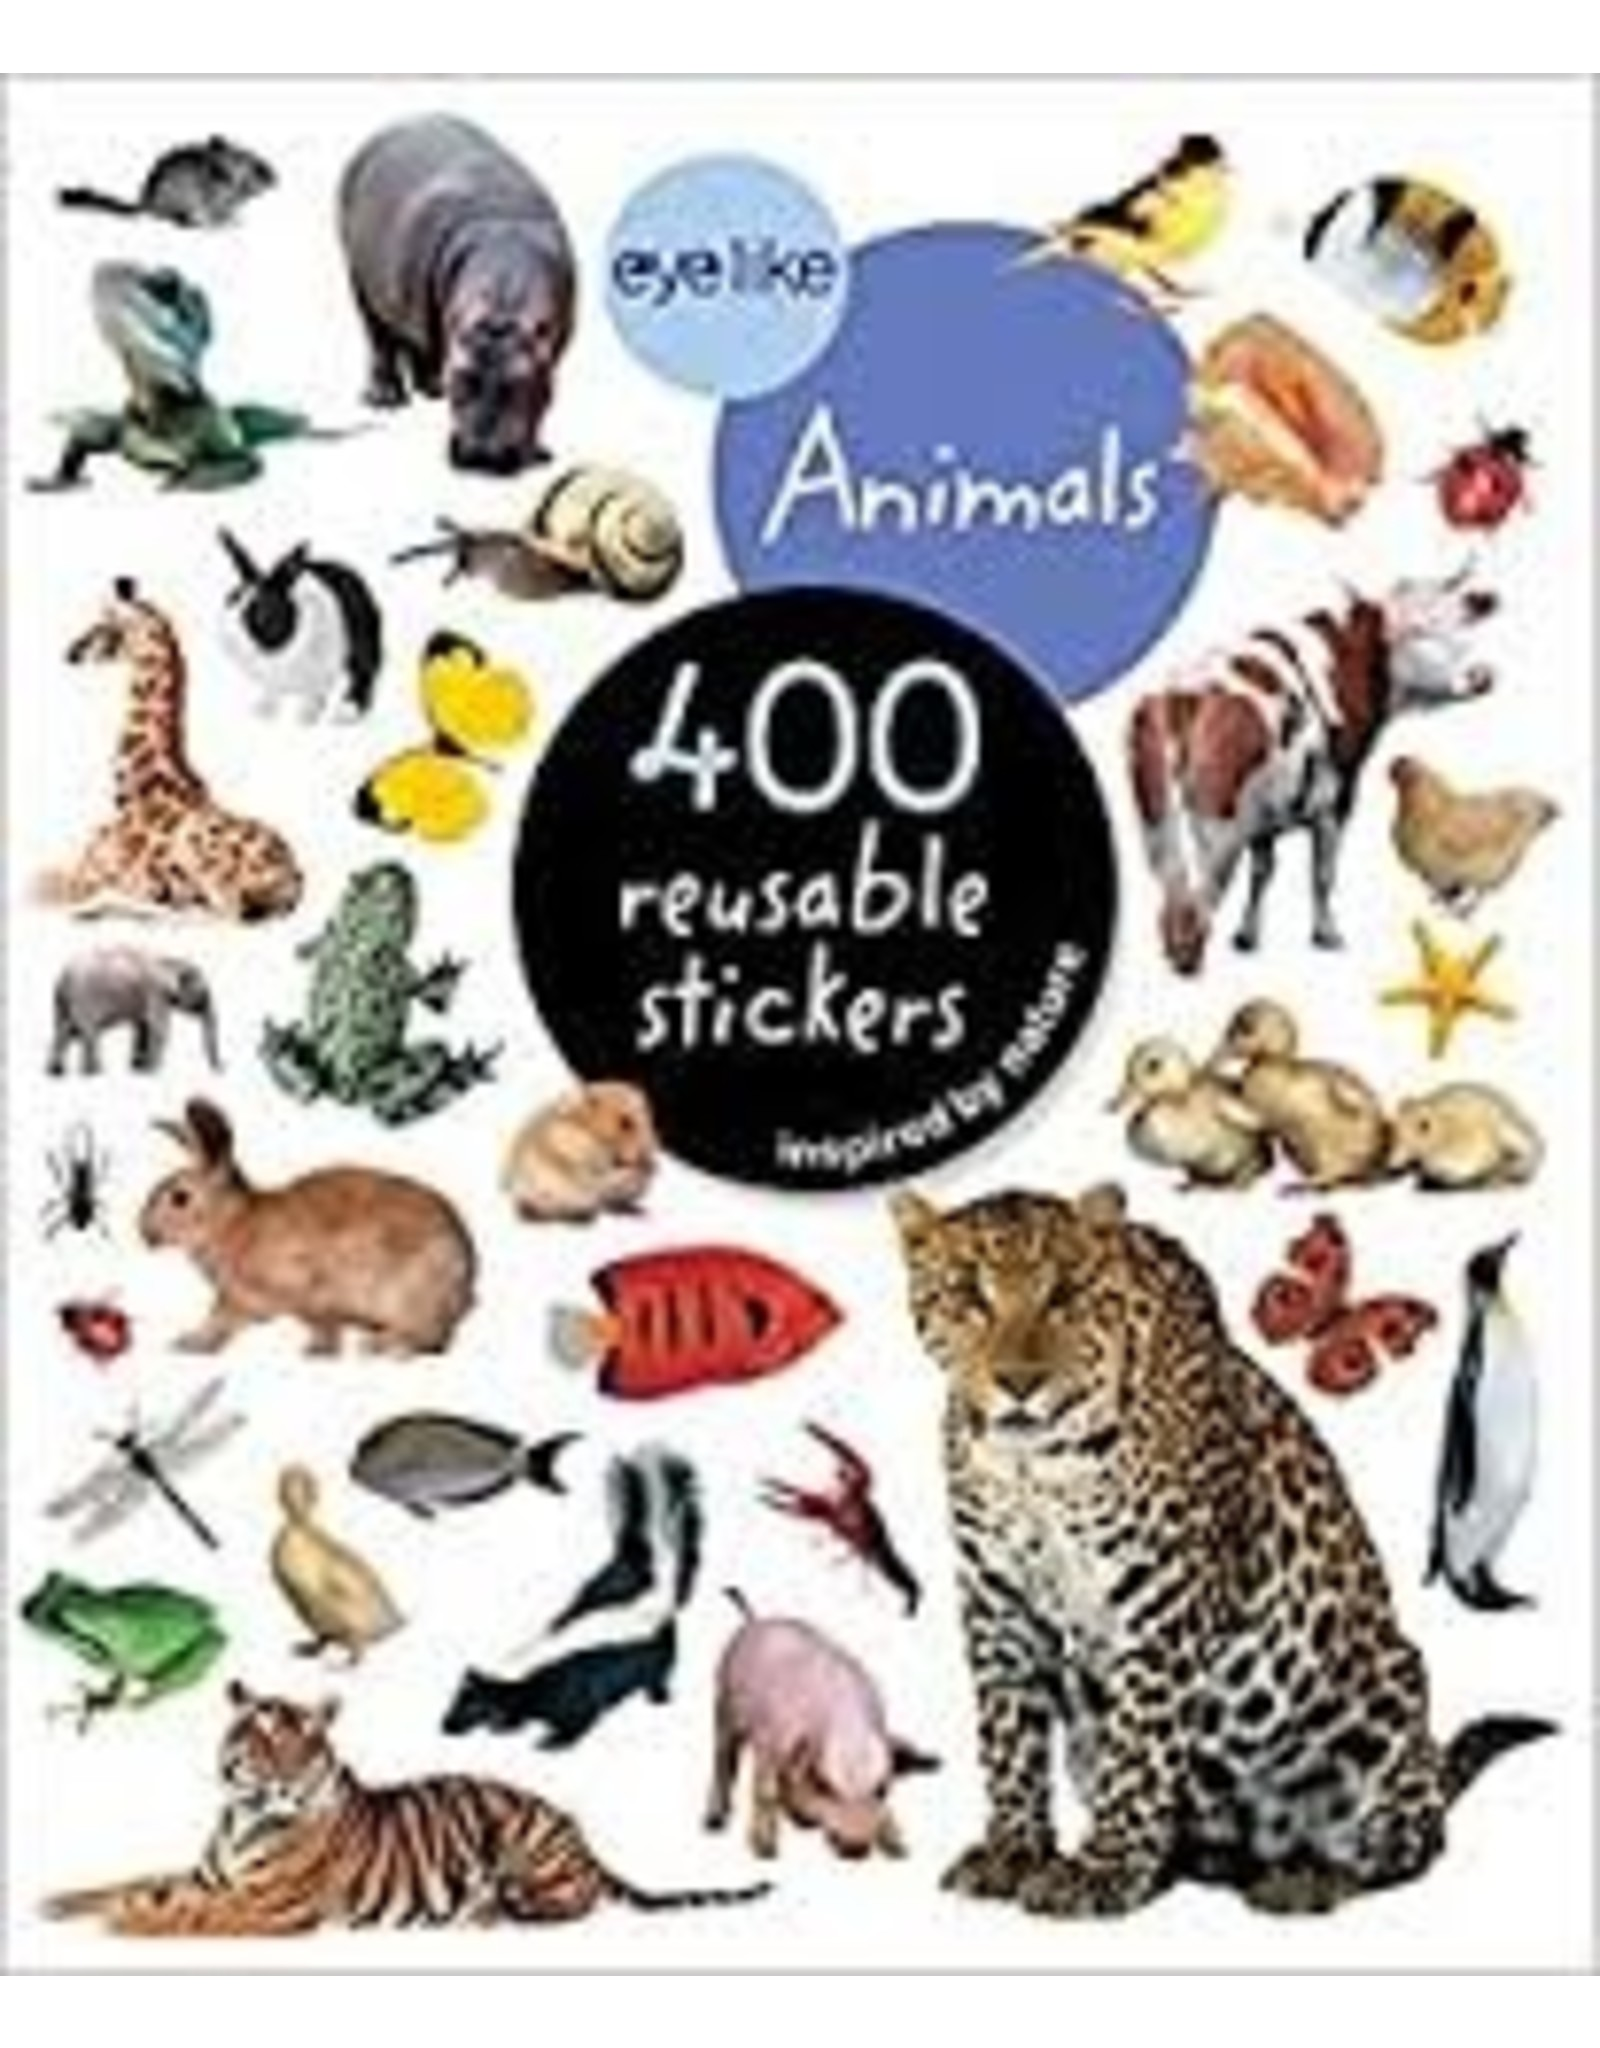 Books Eye Like Animals 400 Resuable stickers